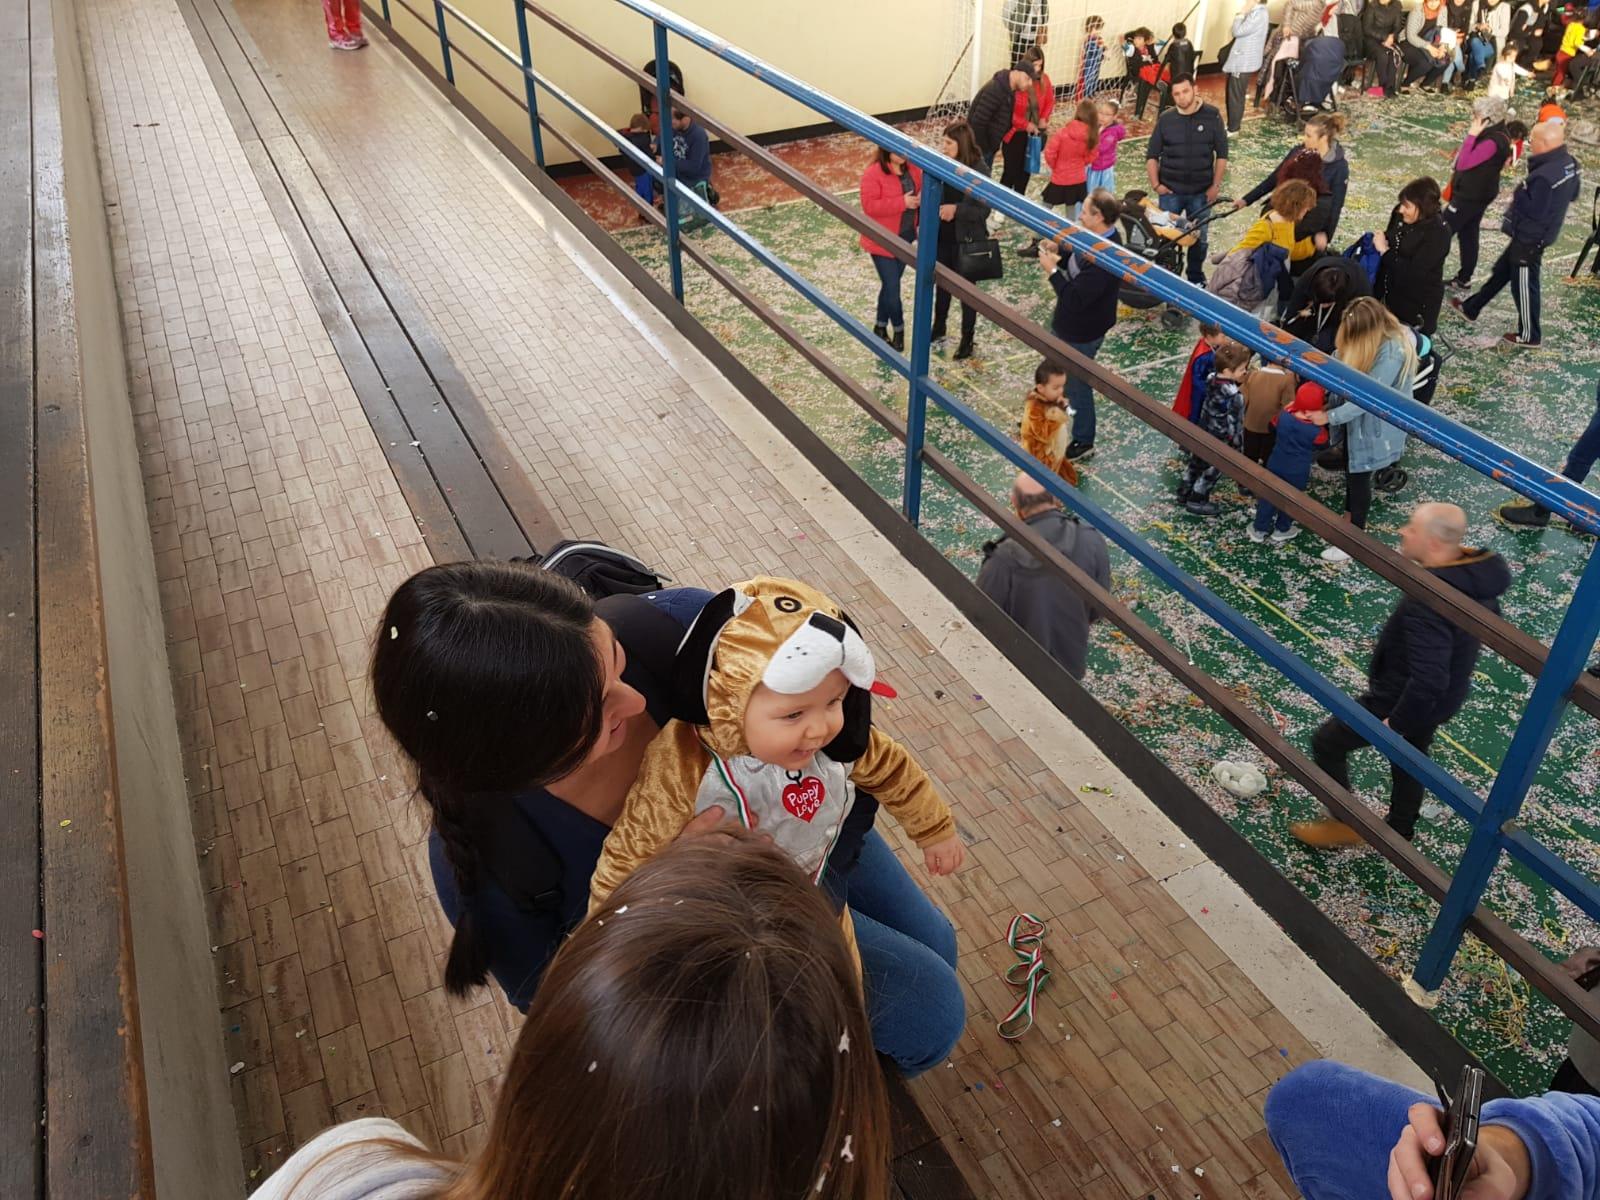 Baraonda Carnevale 2019 (286)